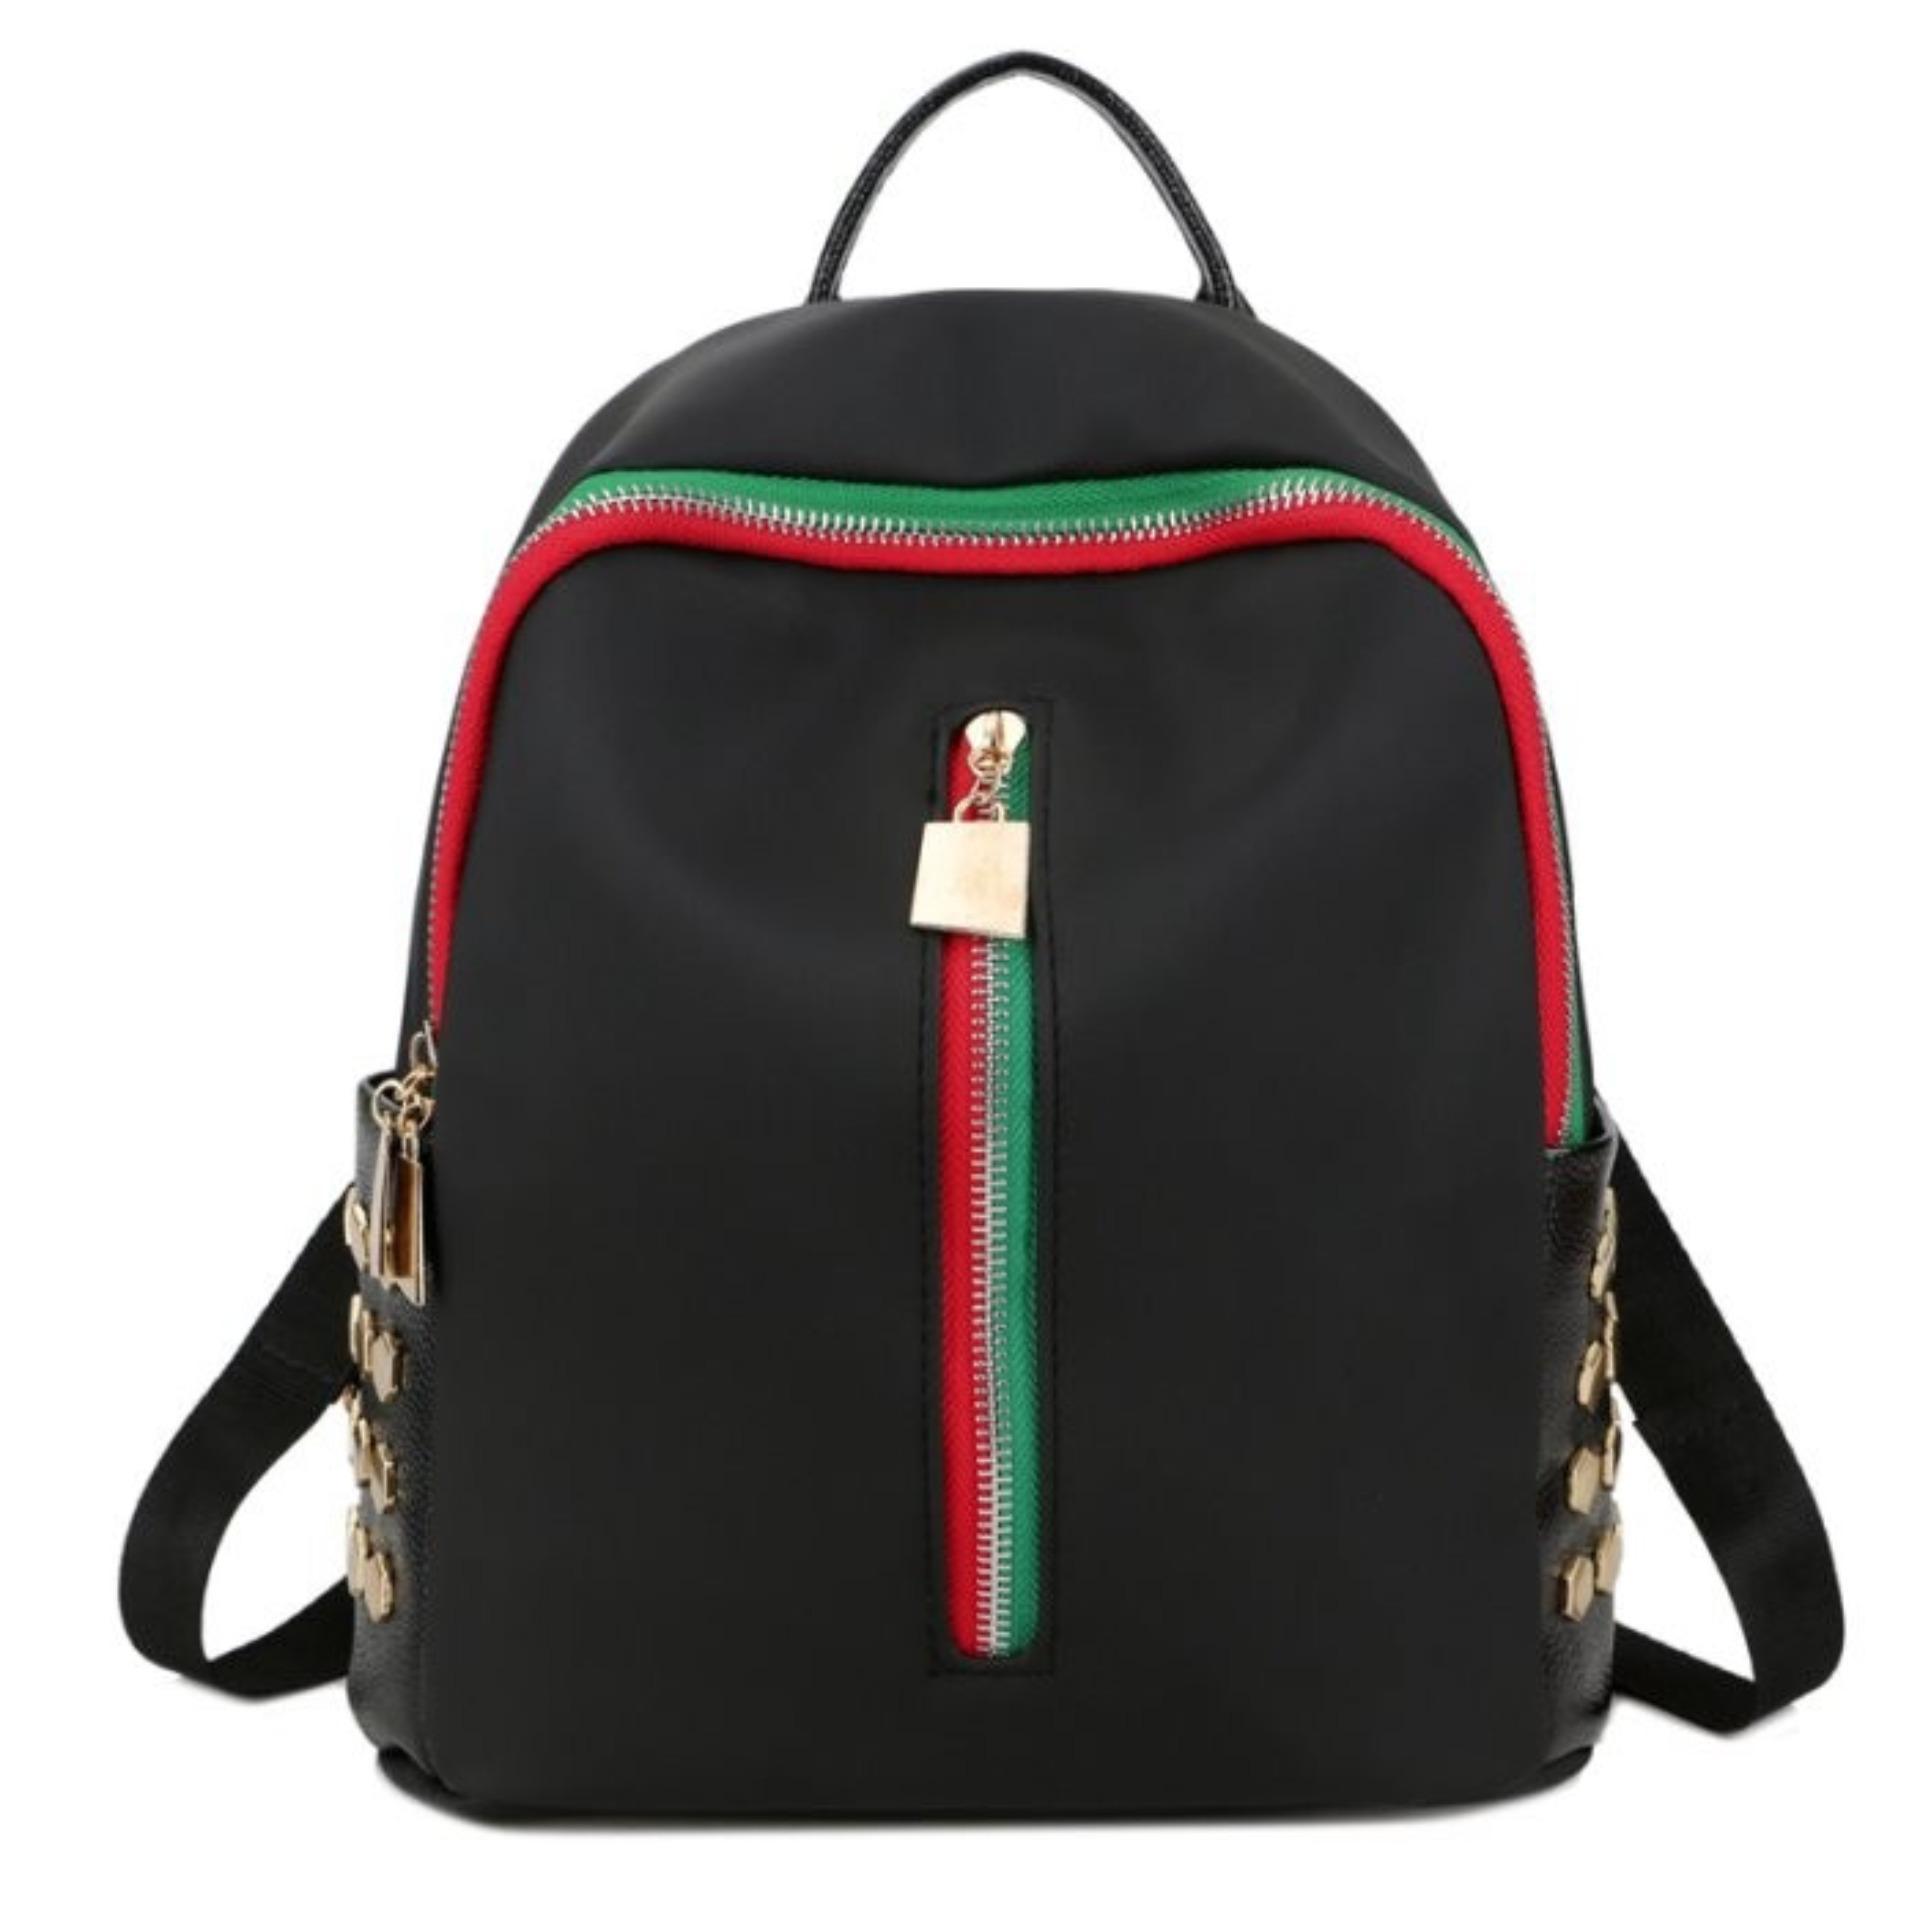 KGS Tas Ransel Mini Backpack Wanita Casual Red Green Vertical Zipper Hitam